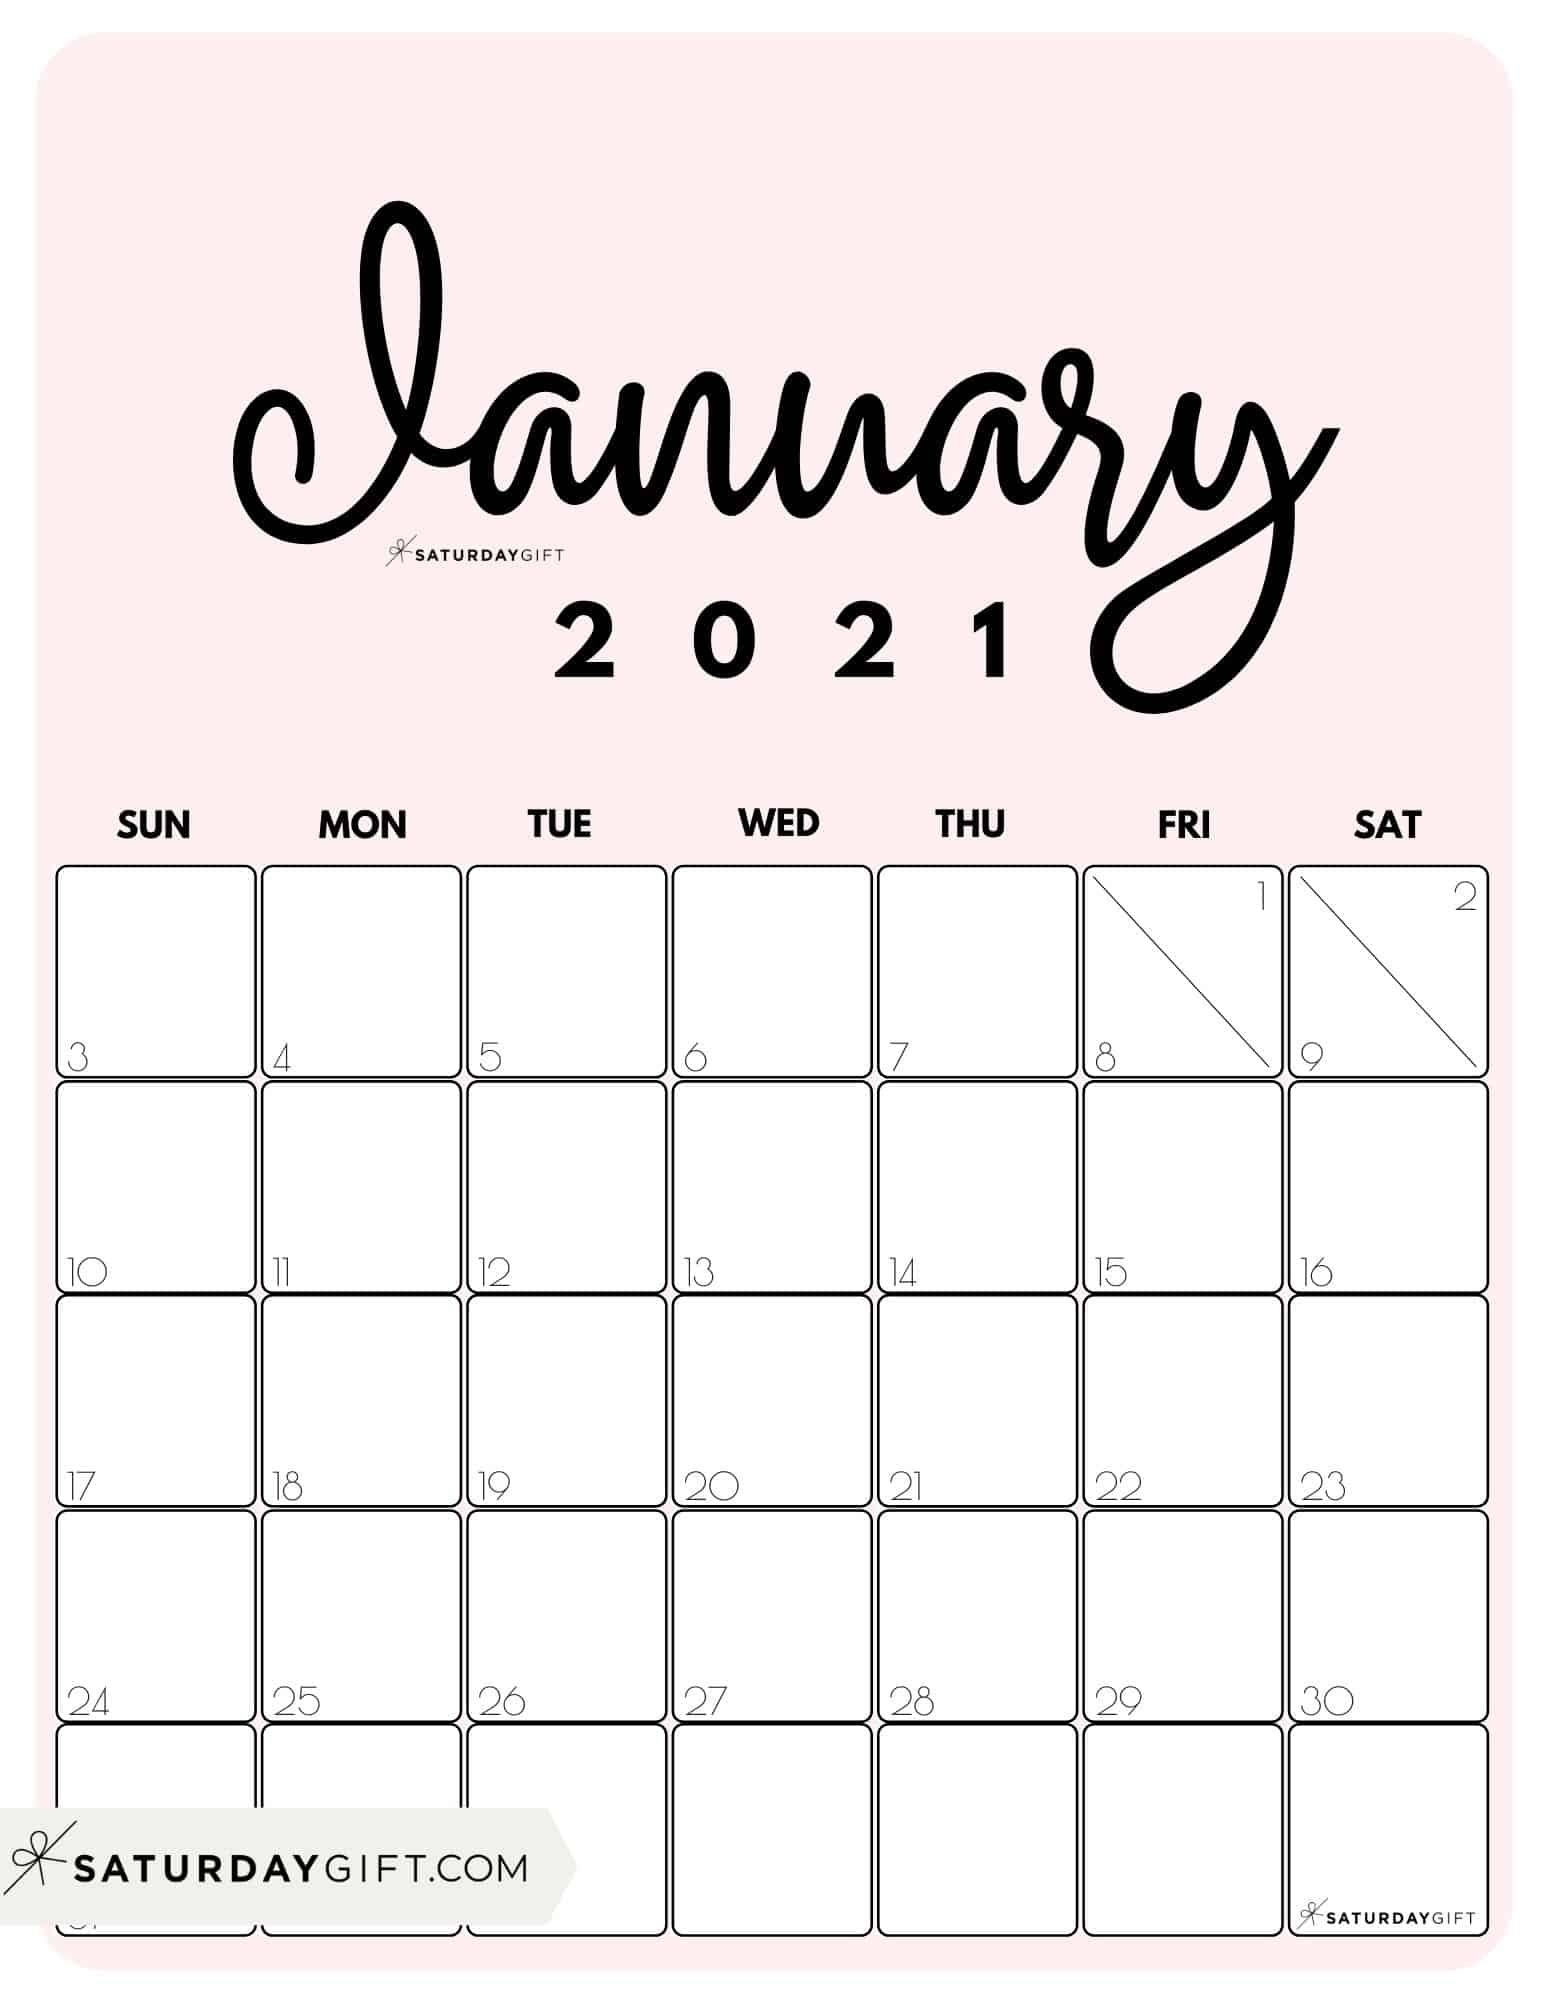 Get 2021 Calendar Printable Cute